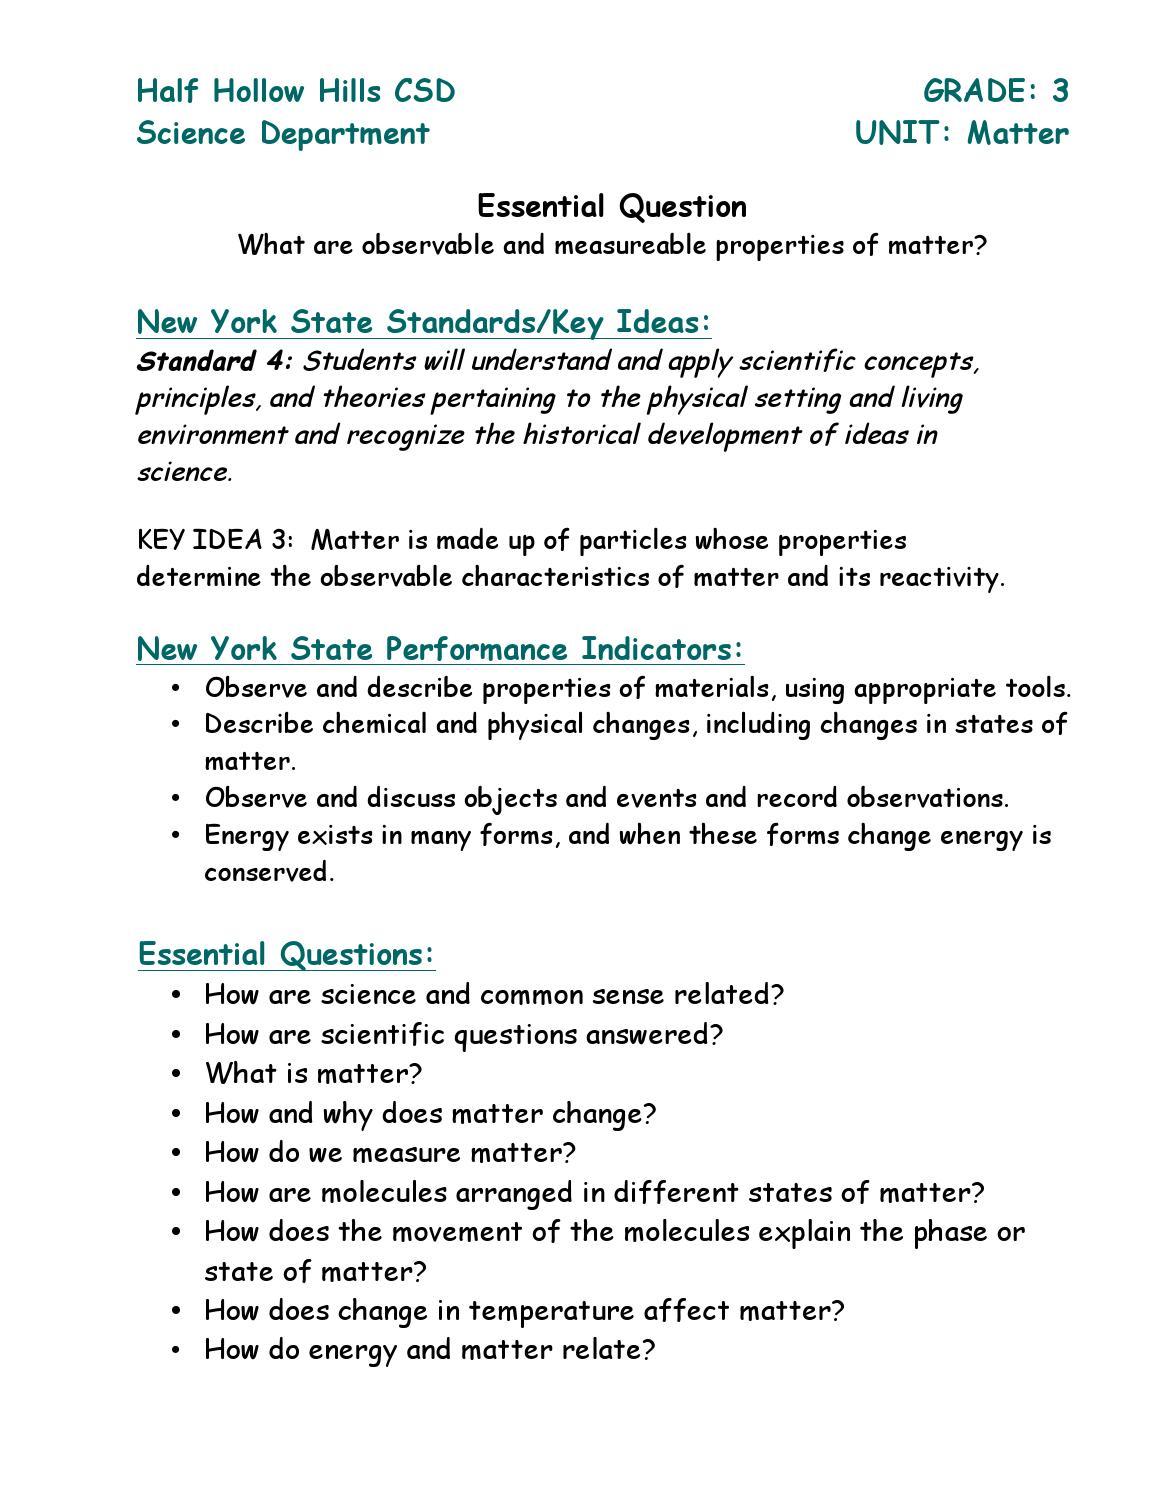 hight resolution of Grade 3 matter unit by Half Hollow Hills Schools - issuu